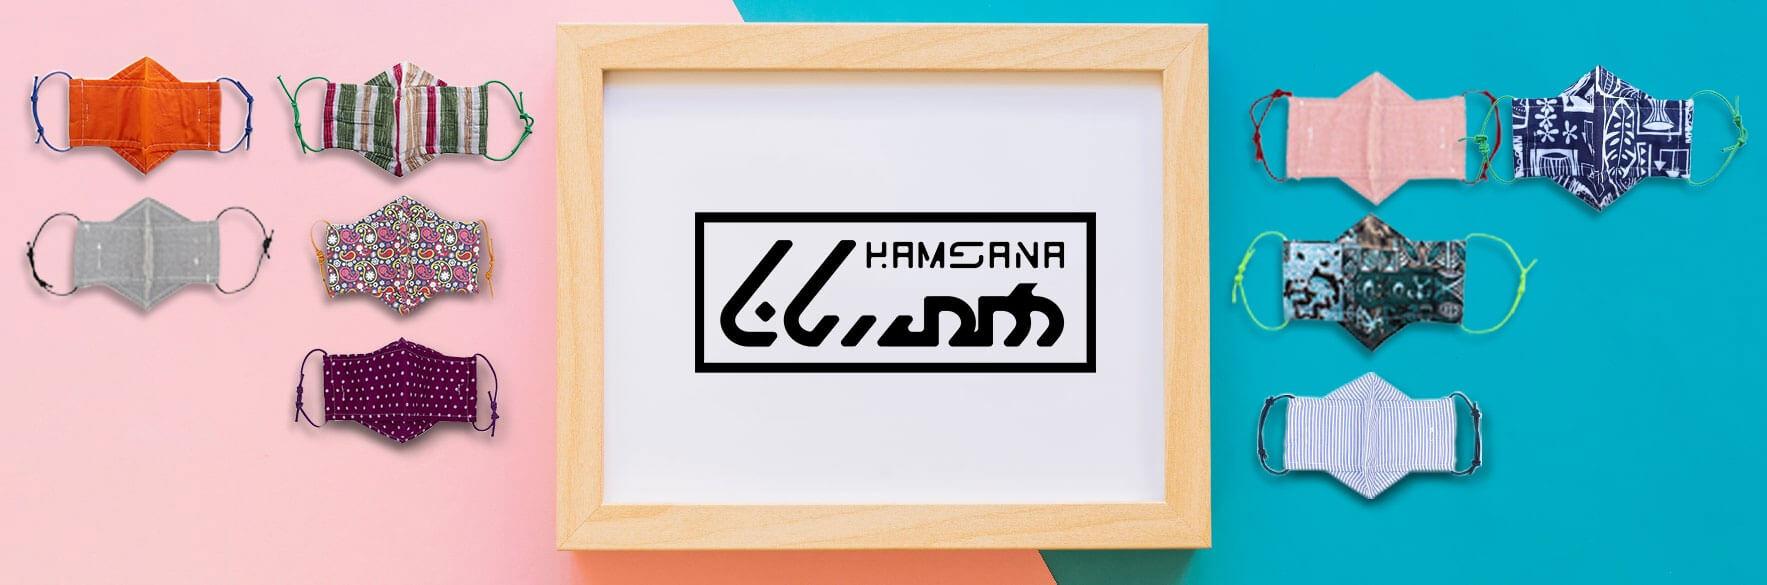 همسانا